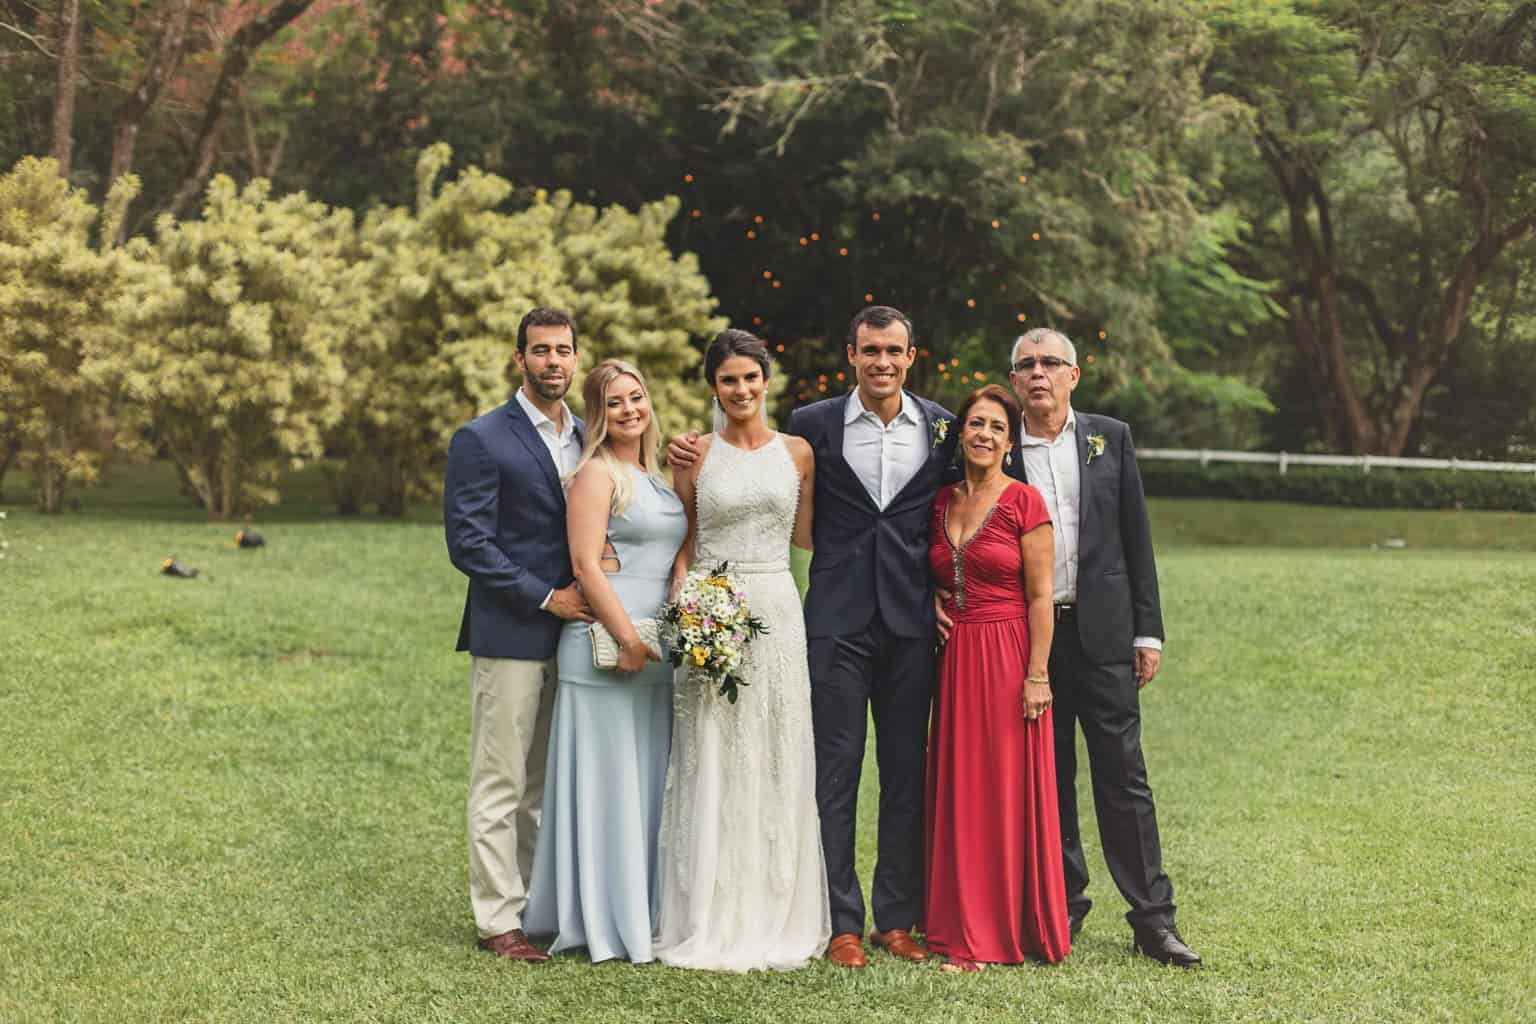 casamento-Ana-Cecilia-e-Leonardo-casamento-na-serra-graviola-filmes-graviolafilmes-laura-camapnella-de-siervi-lauracampanella-pais-dos-noivos-studio-laura-camapnella5